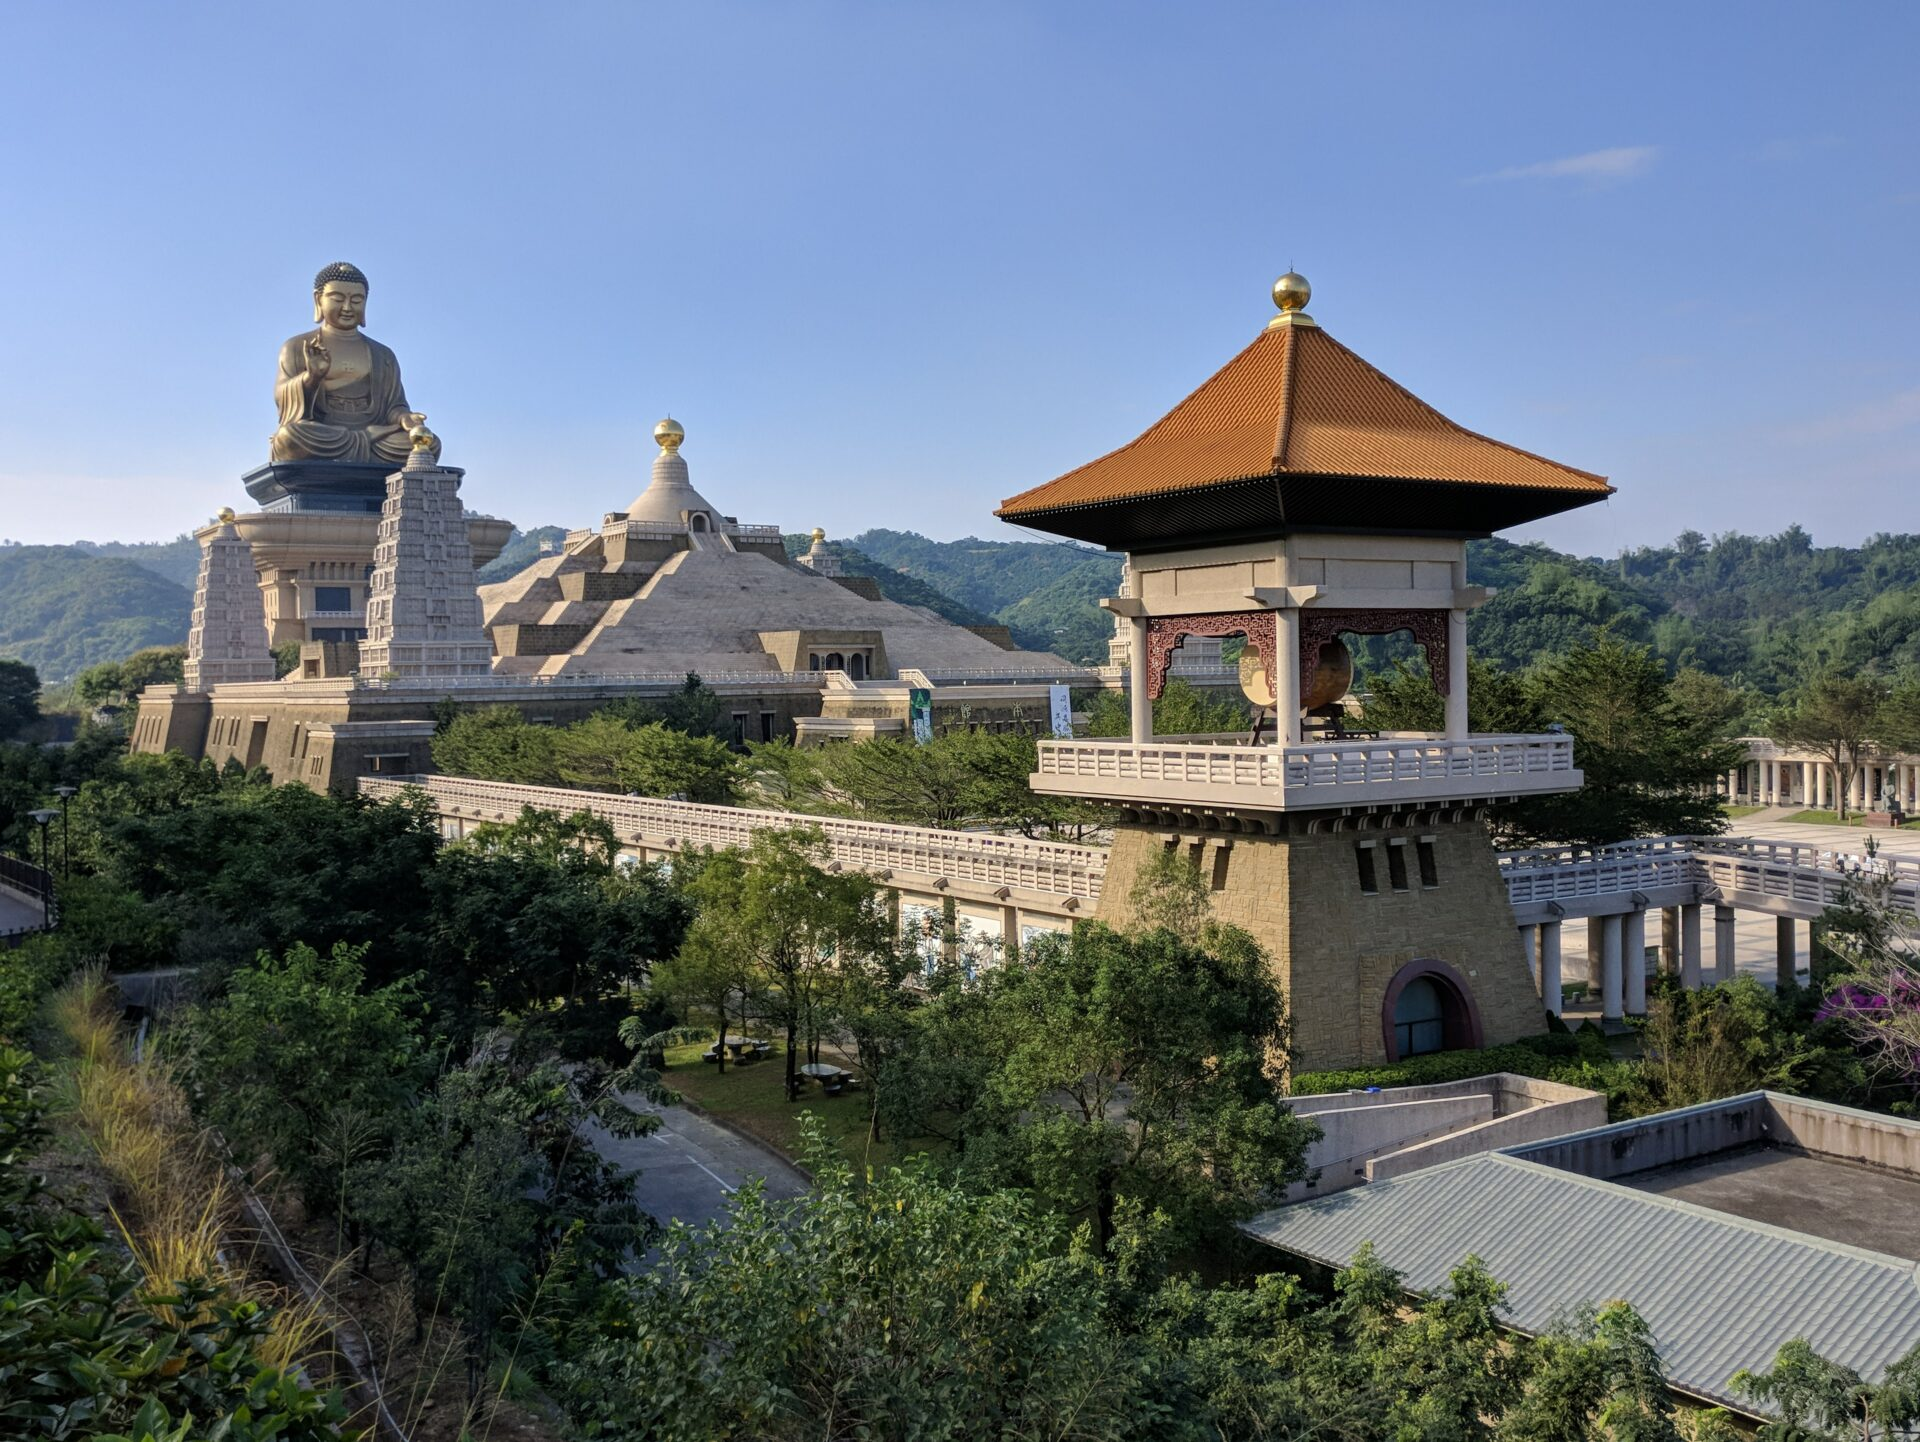 Fo Guang Shan Buddha Memorial Hall